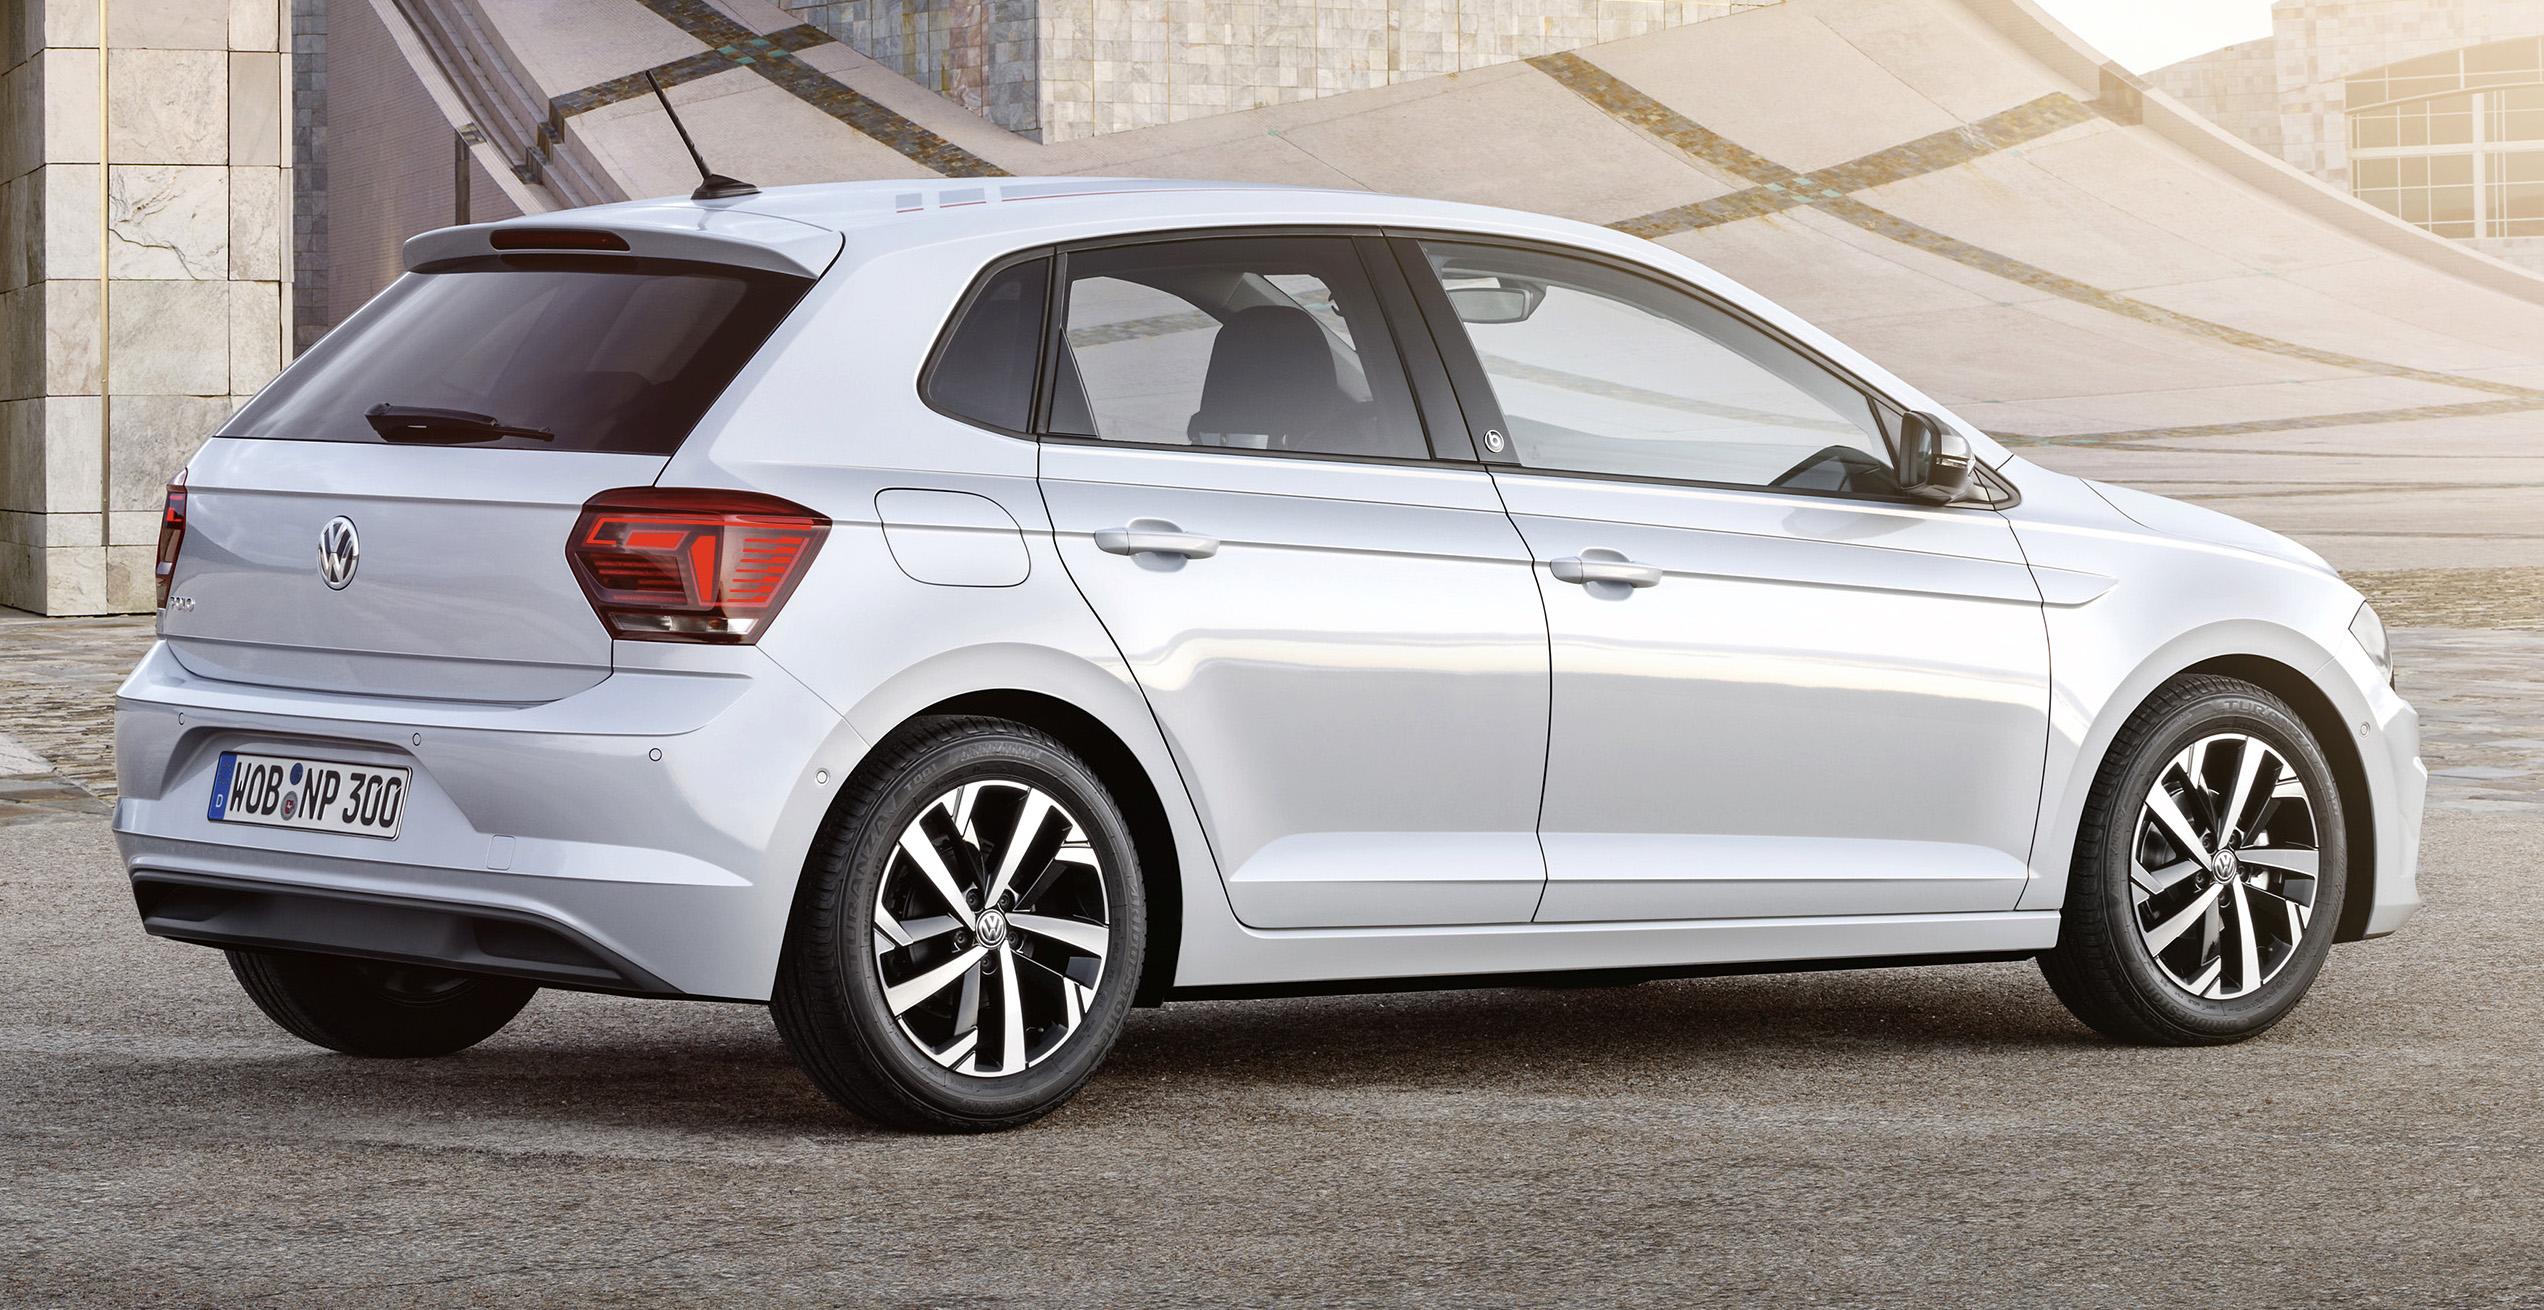 2018 Volkswagen Polo Mk6 Gets Mqb Platform New Active